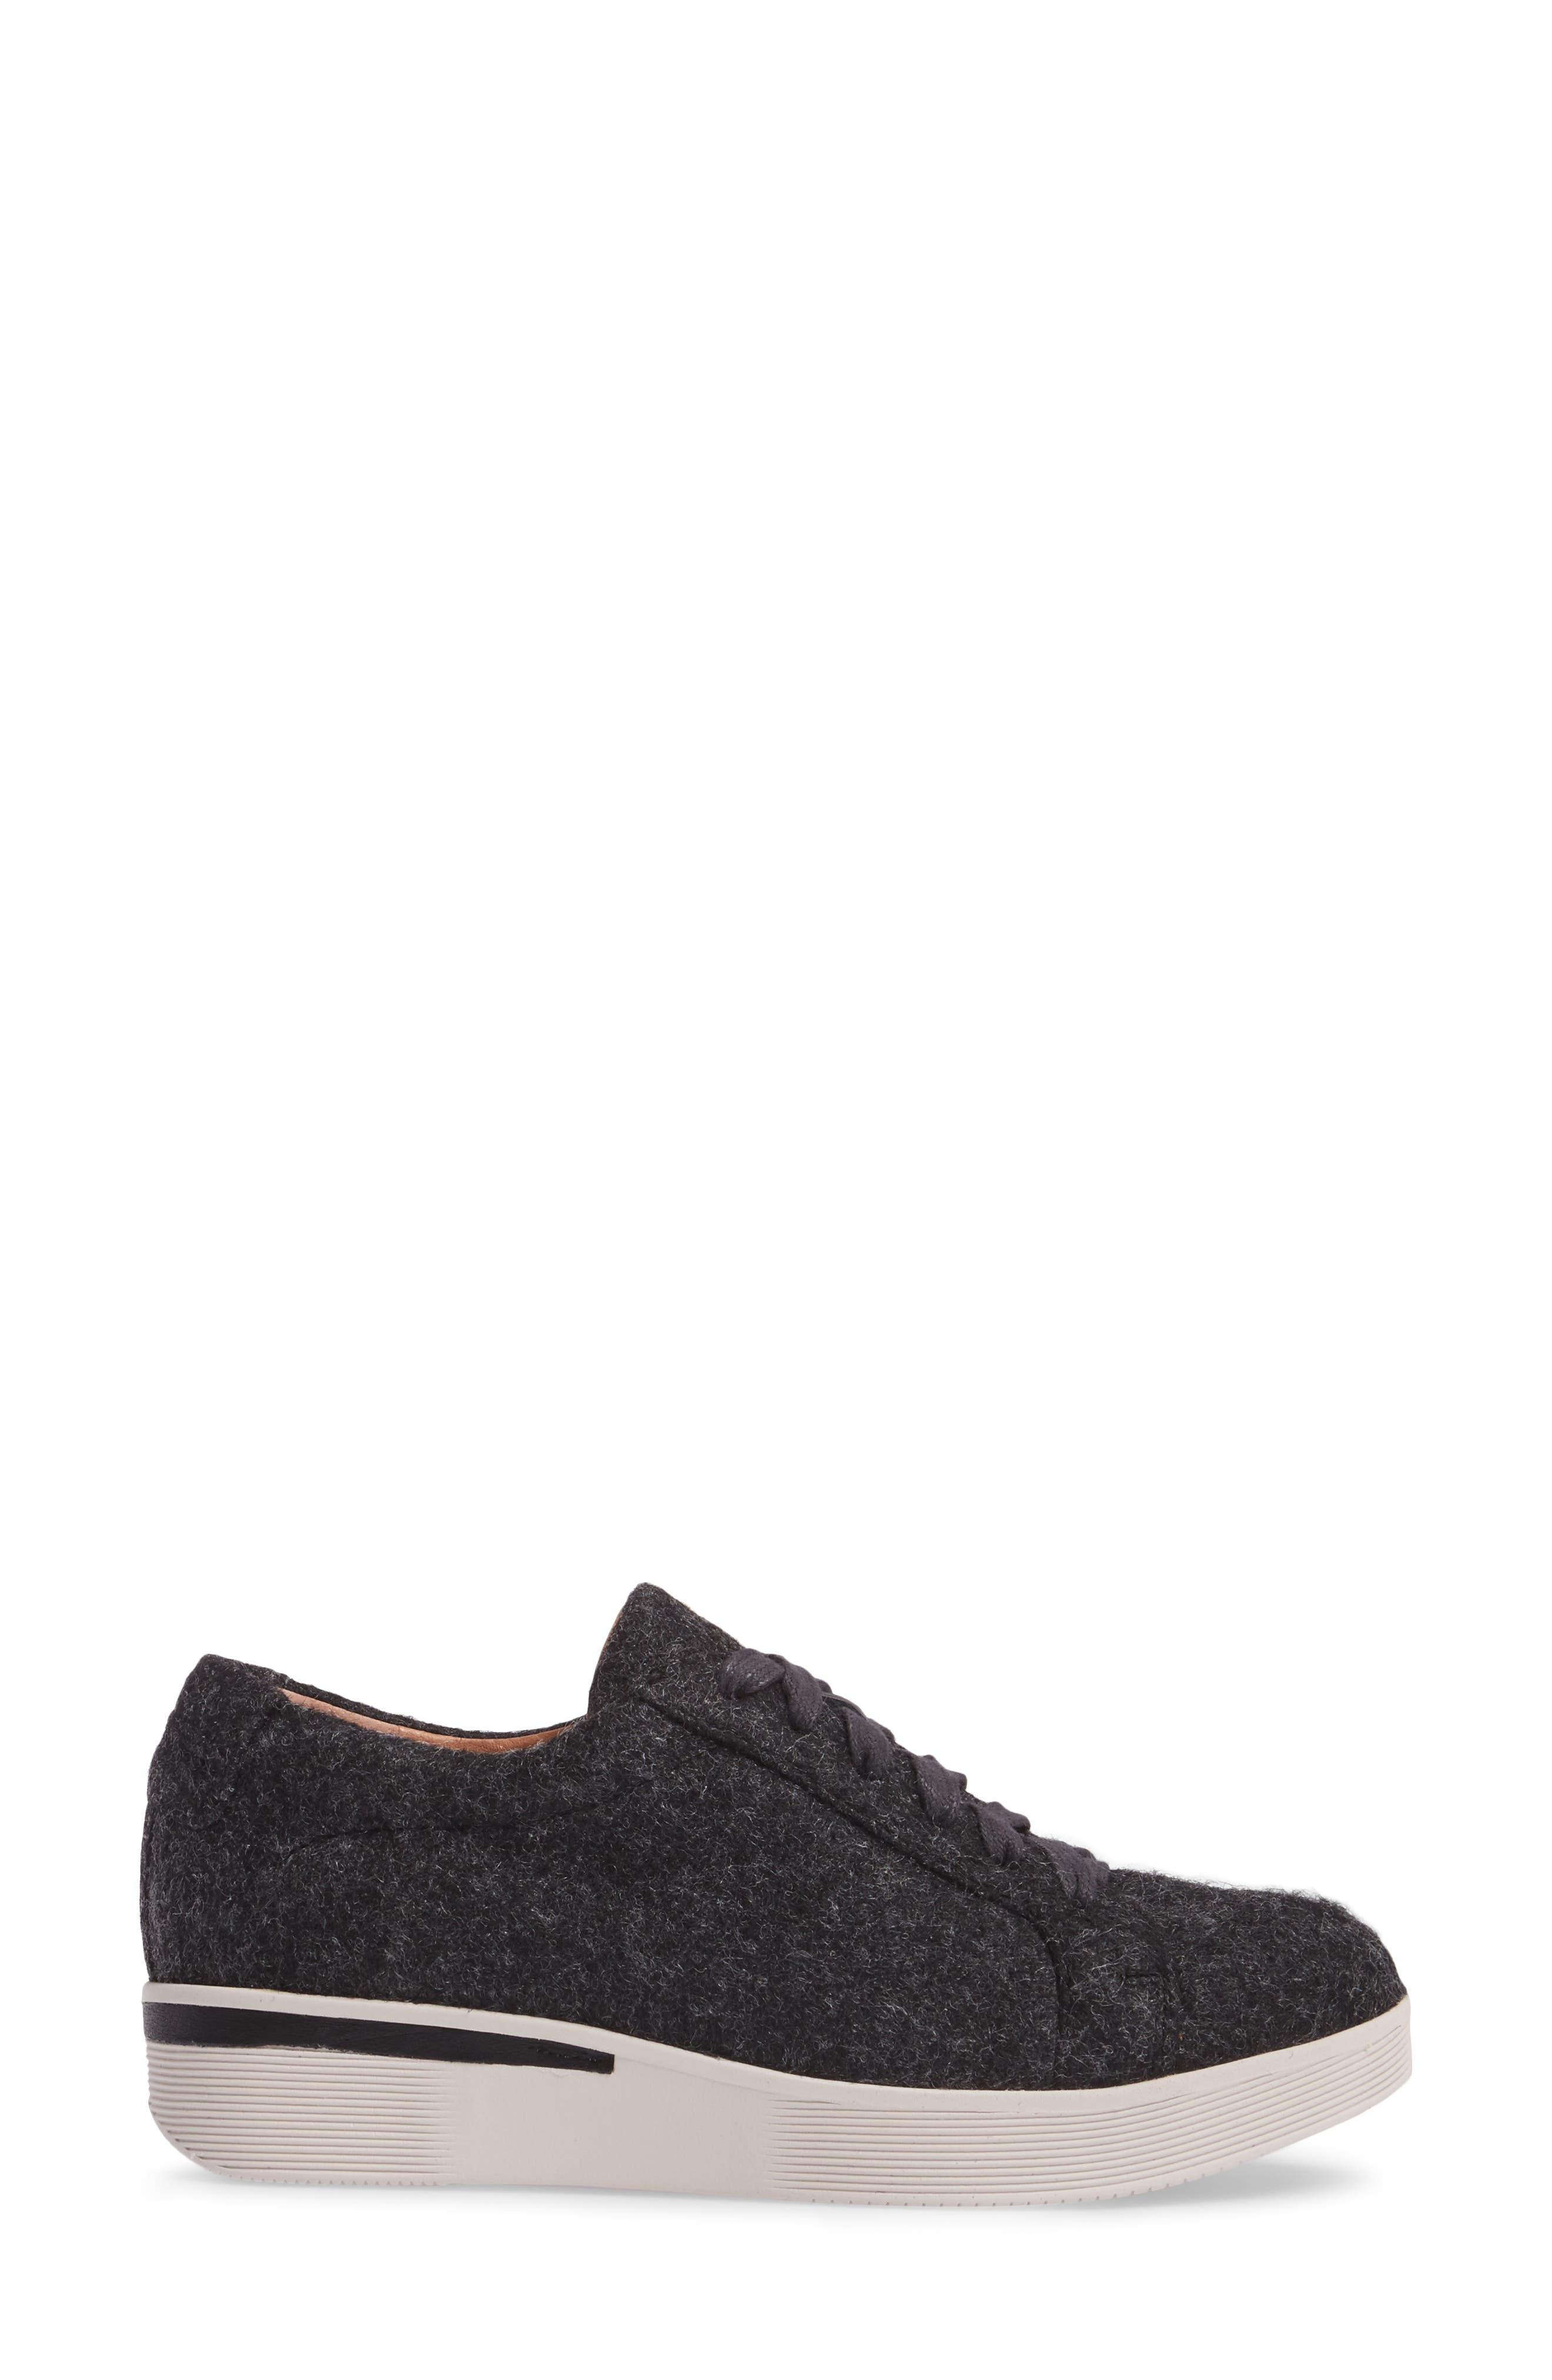 GENTLE SOULS BY KENNETH COLE, Haddie Low Platform Sneaker, Alternate thumbnail 3, color, HEATHER GREY WOOL